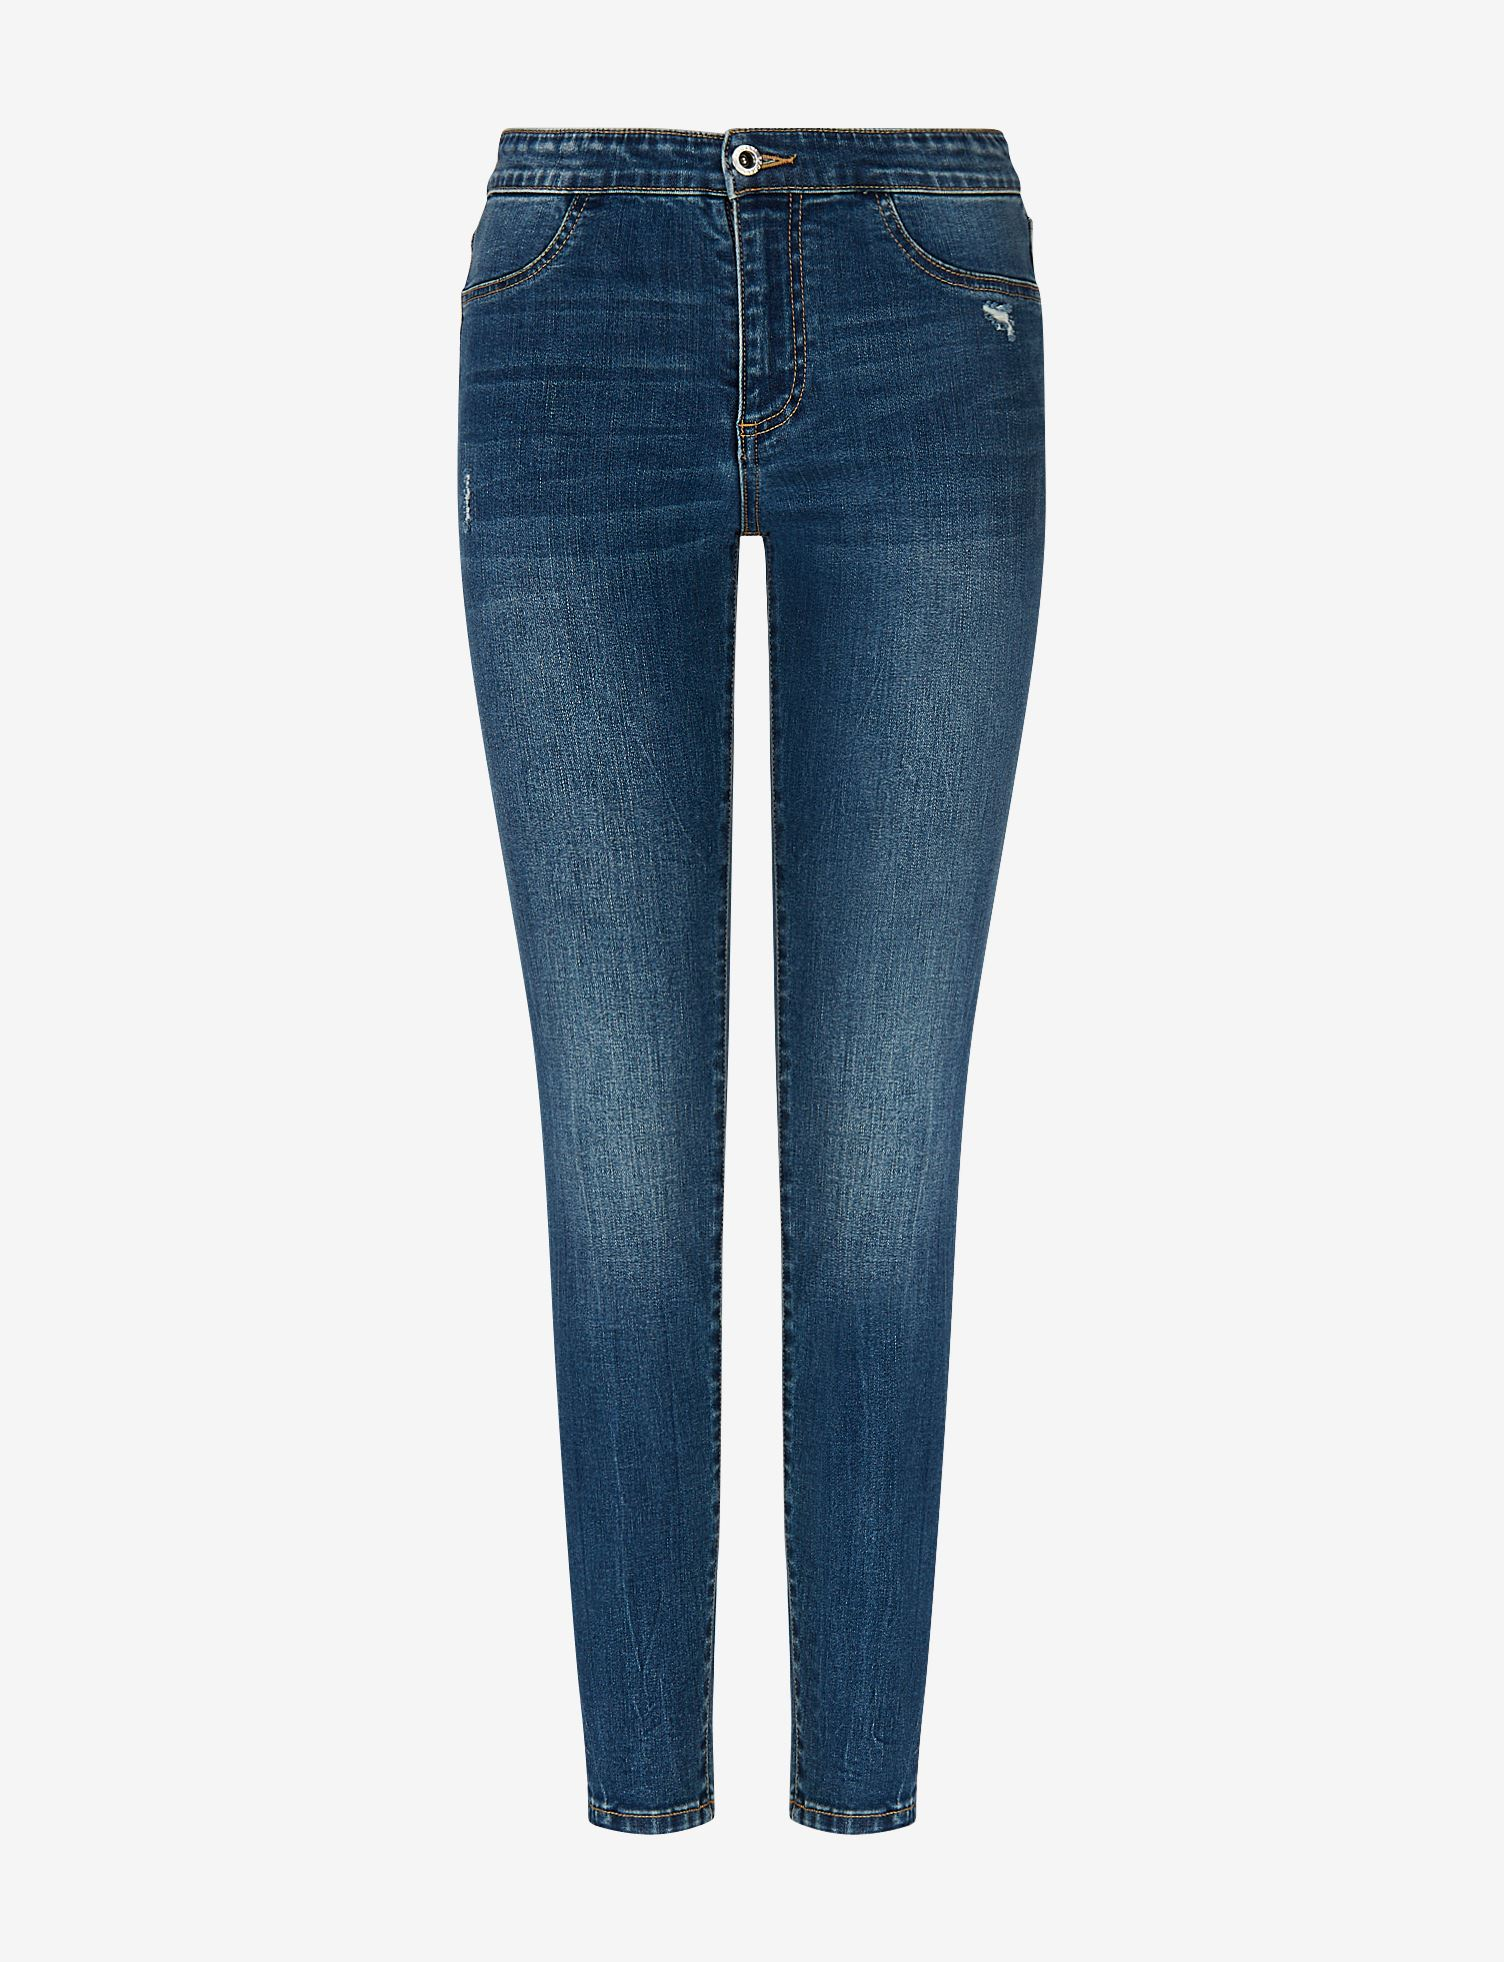 Cinque tasche in denim J12 jegging lift-up Armani Exchange ARMANI EXCHANGE   Jeans   3KYJ12-Y1EEZ1500